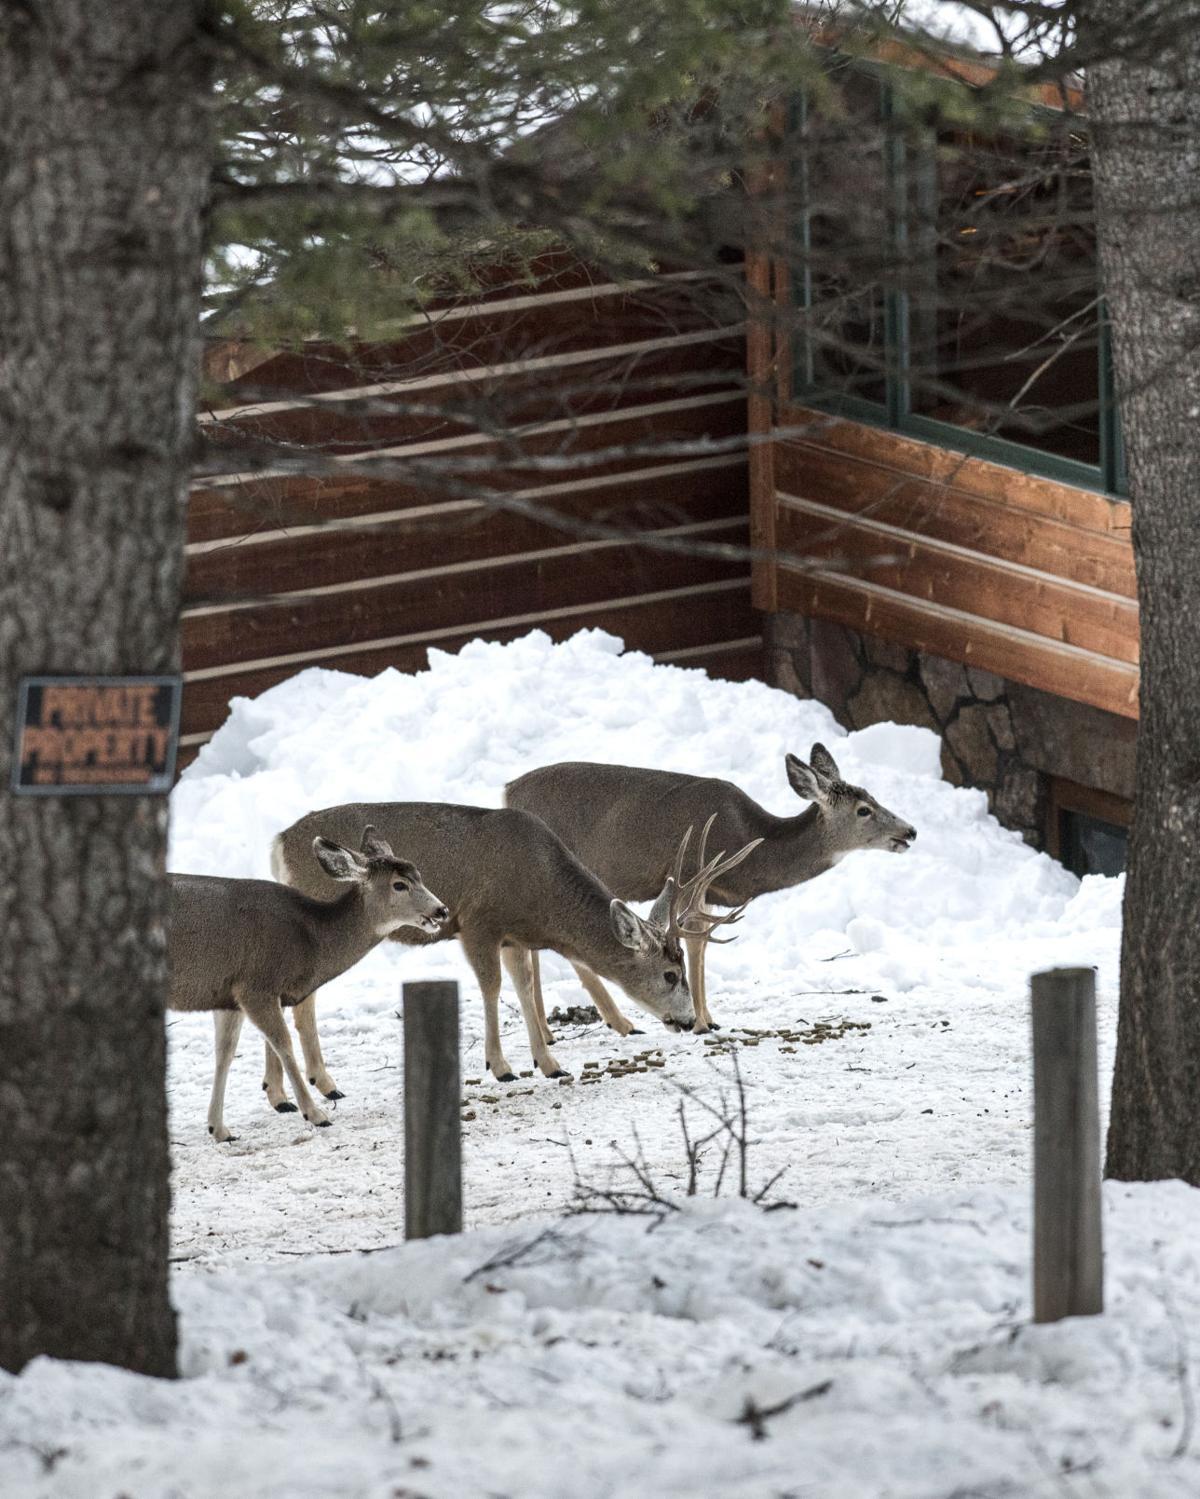 Bans don't halt wildlife feeding | Environmental